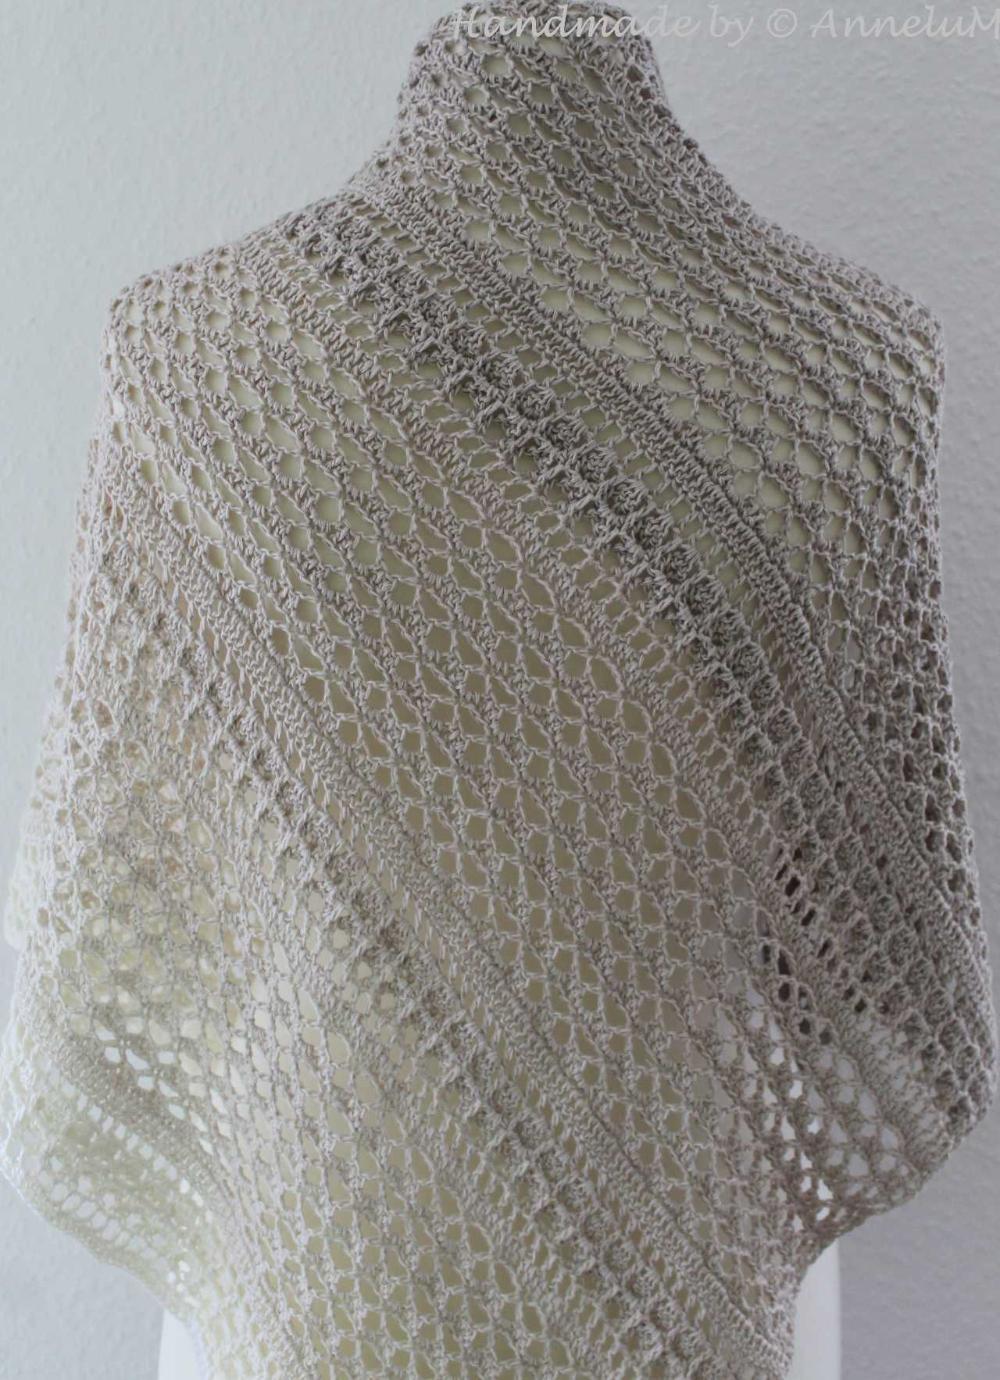 Asymmetric Cloth Duirro Annelum Dreieckstuch Hakeln Tuch Tuch Stricken